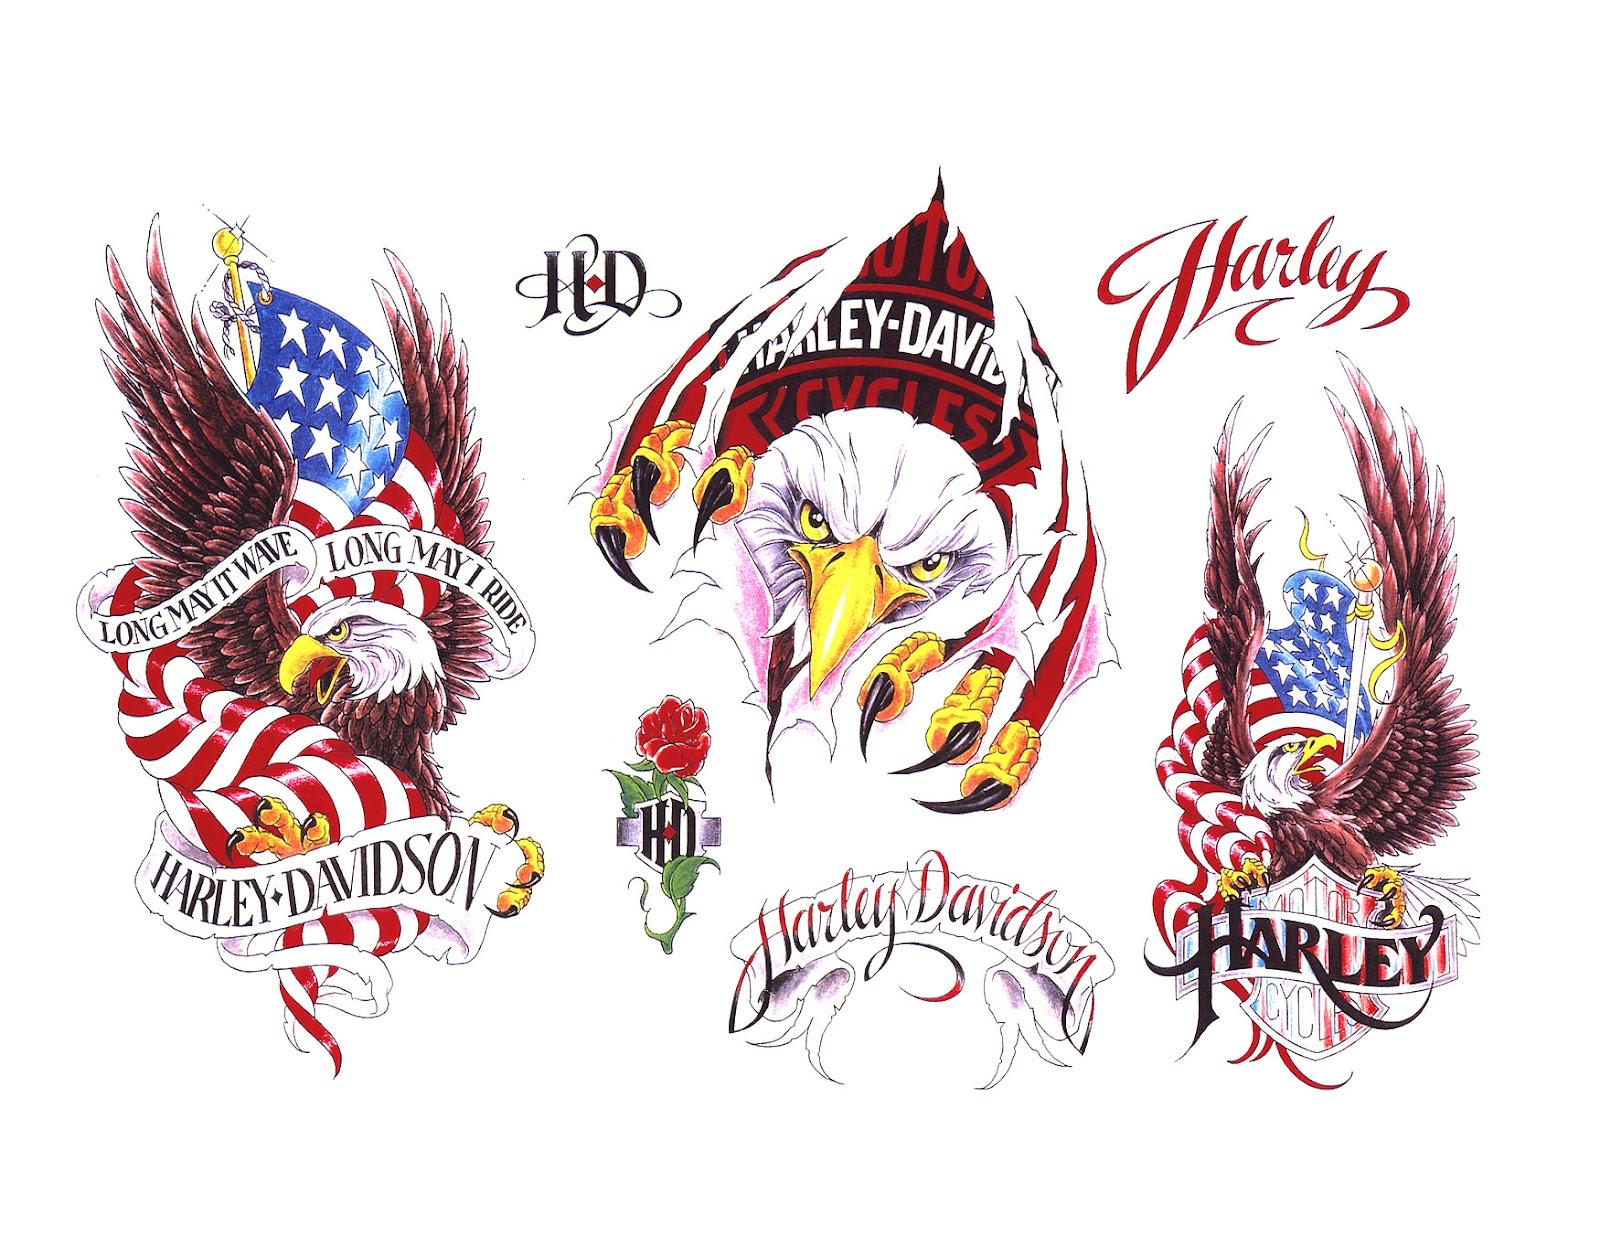 Harley davidson motorcycle harley davidson tattoo designs